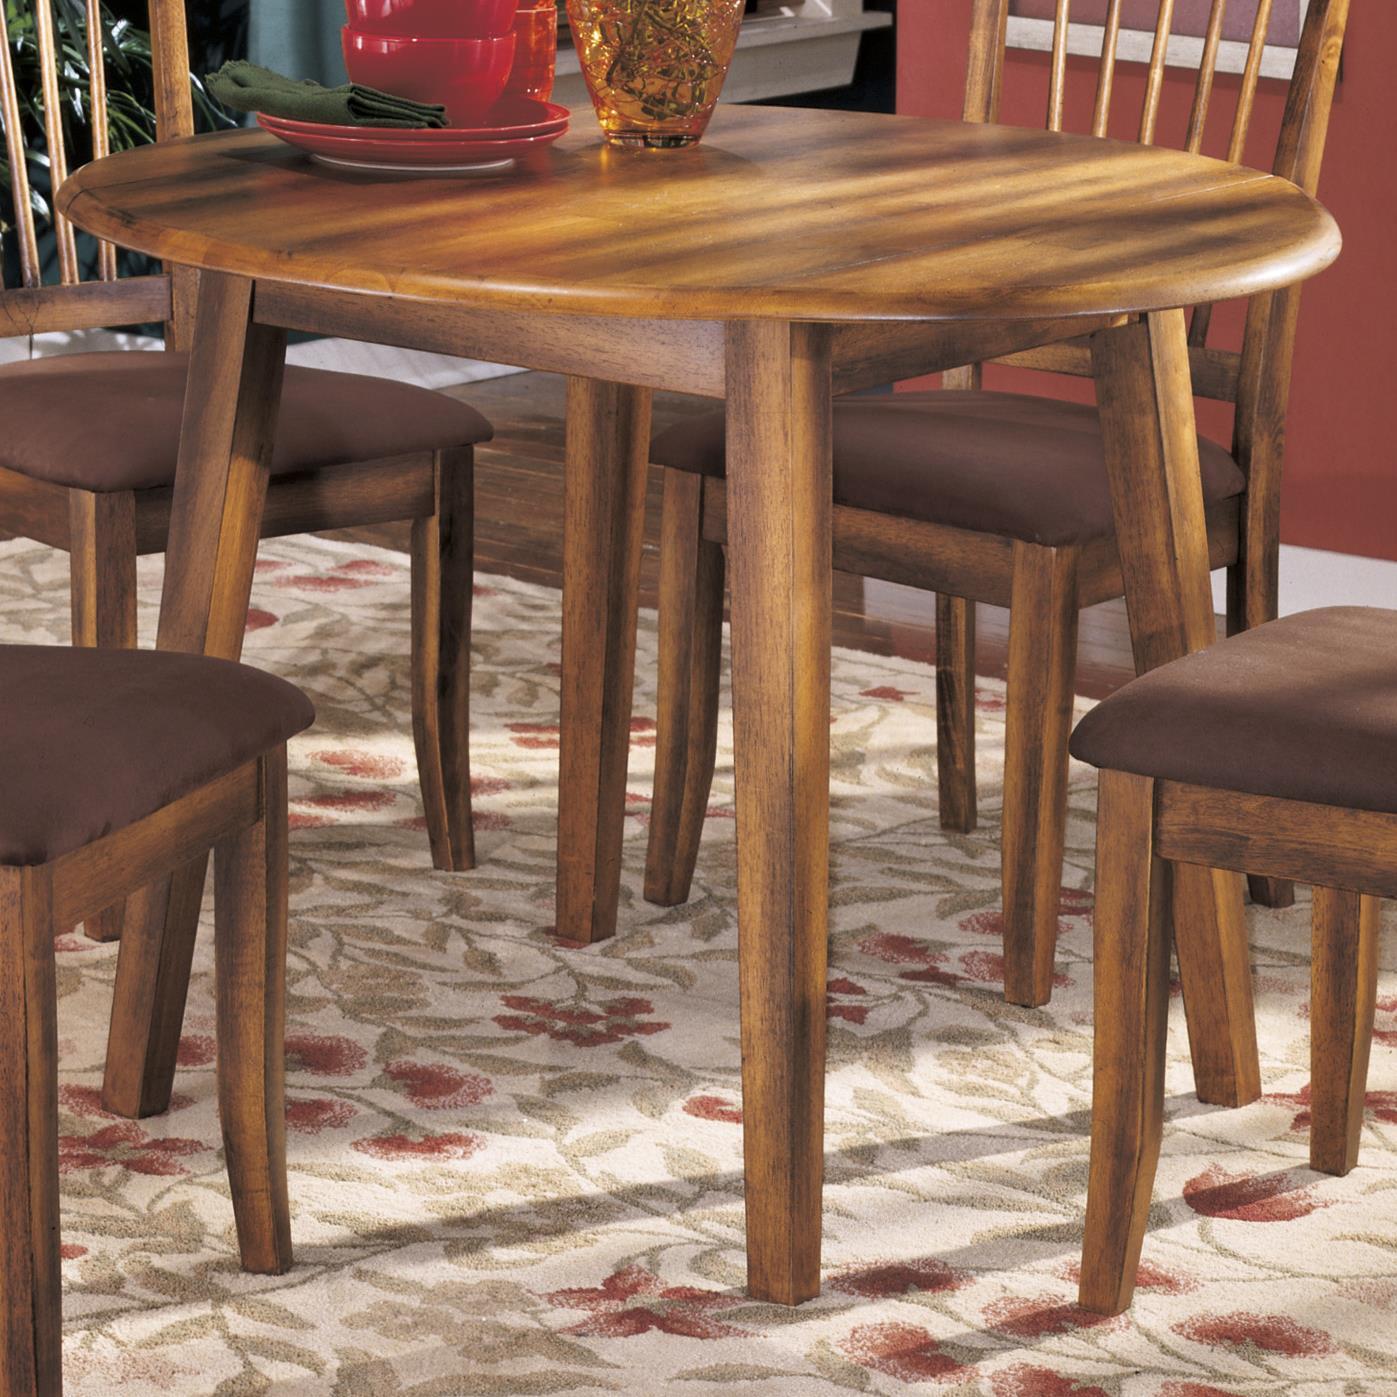 Ashley Furniture BerringerRound Drop Leaf Table ...  sc 1 st  Furniture and ApplianceMart & Ashley Furniture Berringer D199-15 Hickory Stained Hardwood Round ...